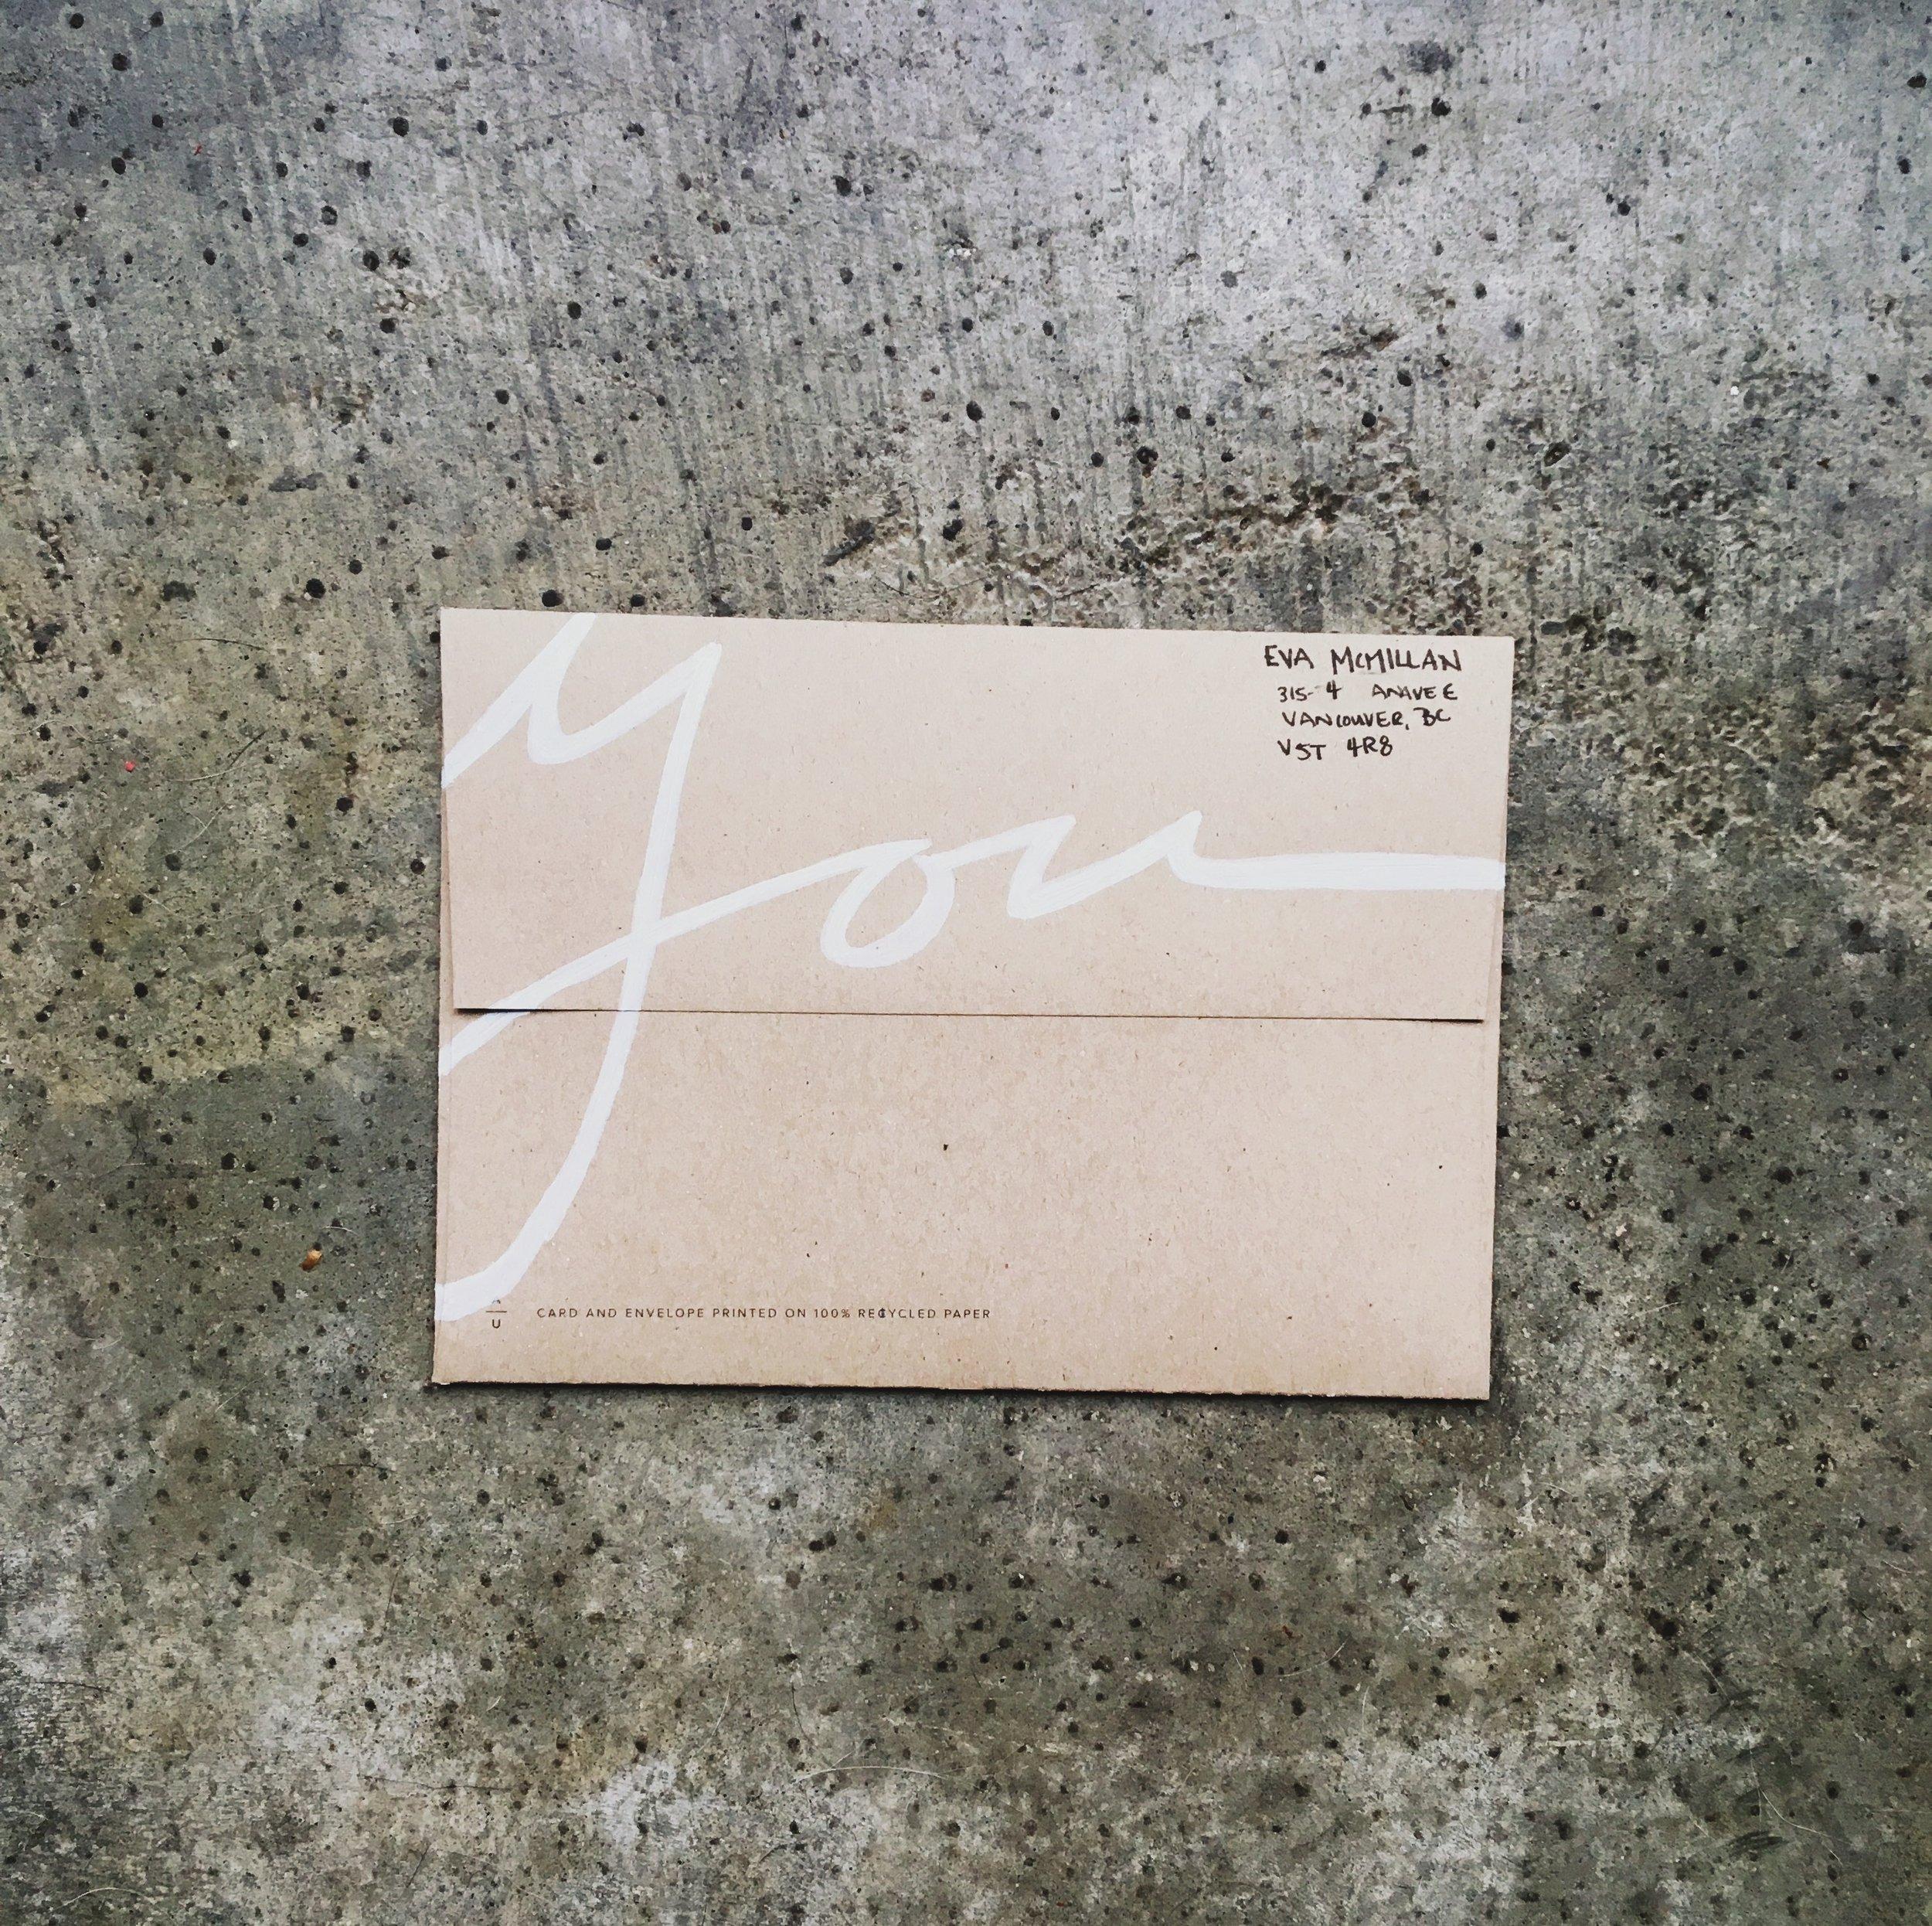 January 2017 Mail Club on livingforeva.com - painted hand lettered envelope